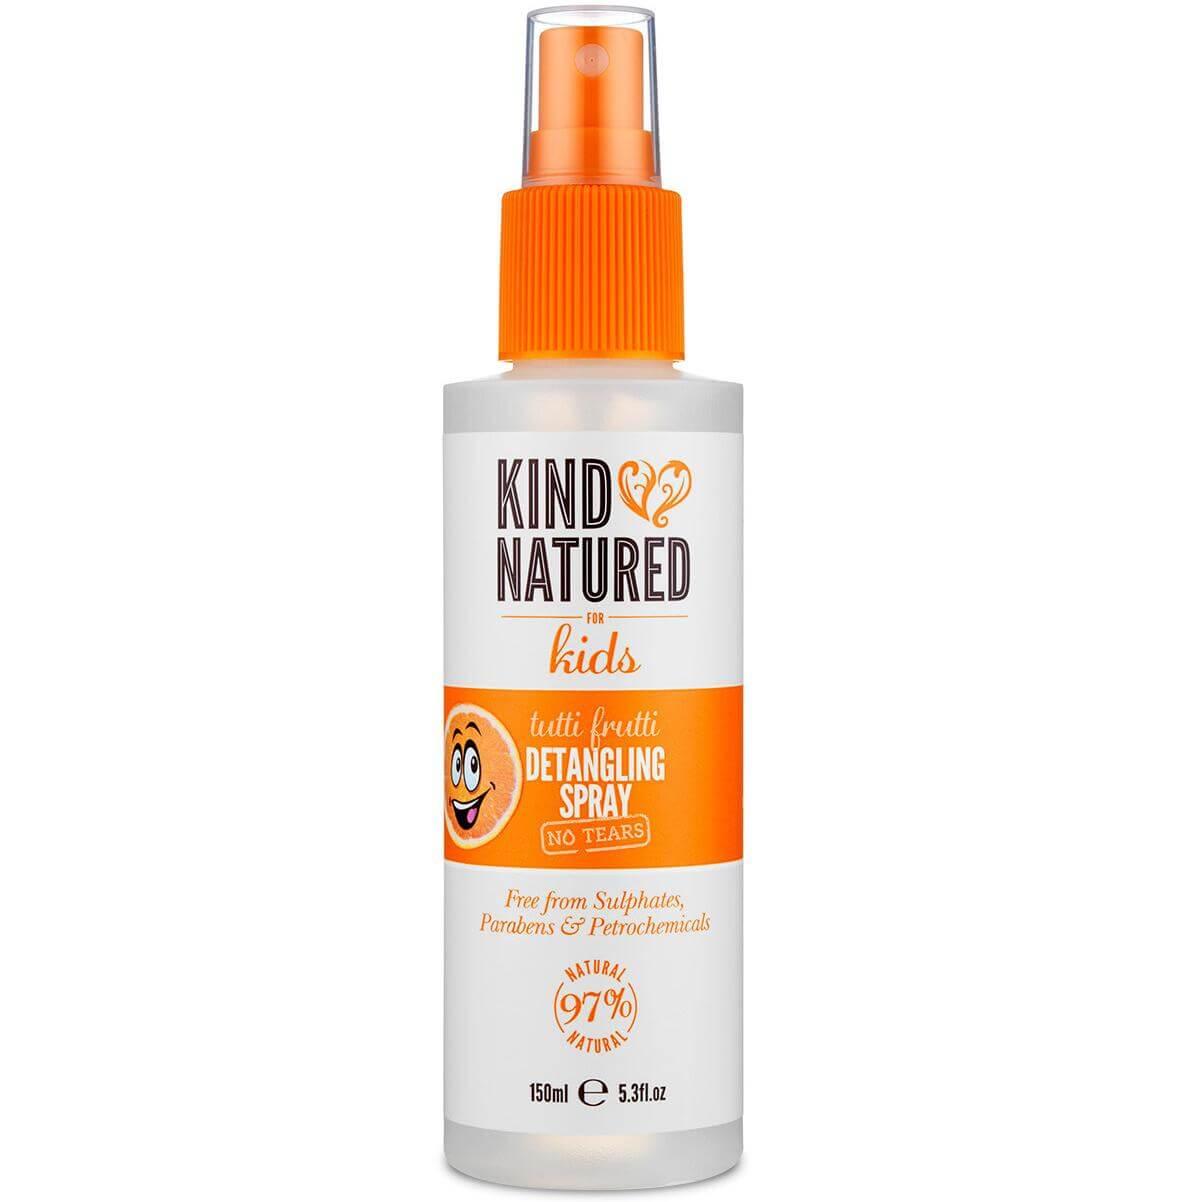 Kind Natured Tutti Frutti Detangling Spay No Tears Παιδικό Spray Μαλλιών με Άρωμα Φρούτων που Ξεμπερδεύει τα Μαλλιά 150ml